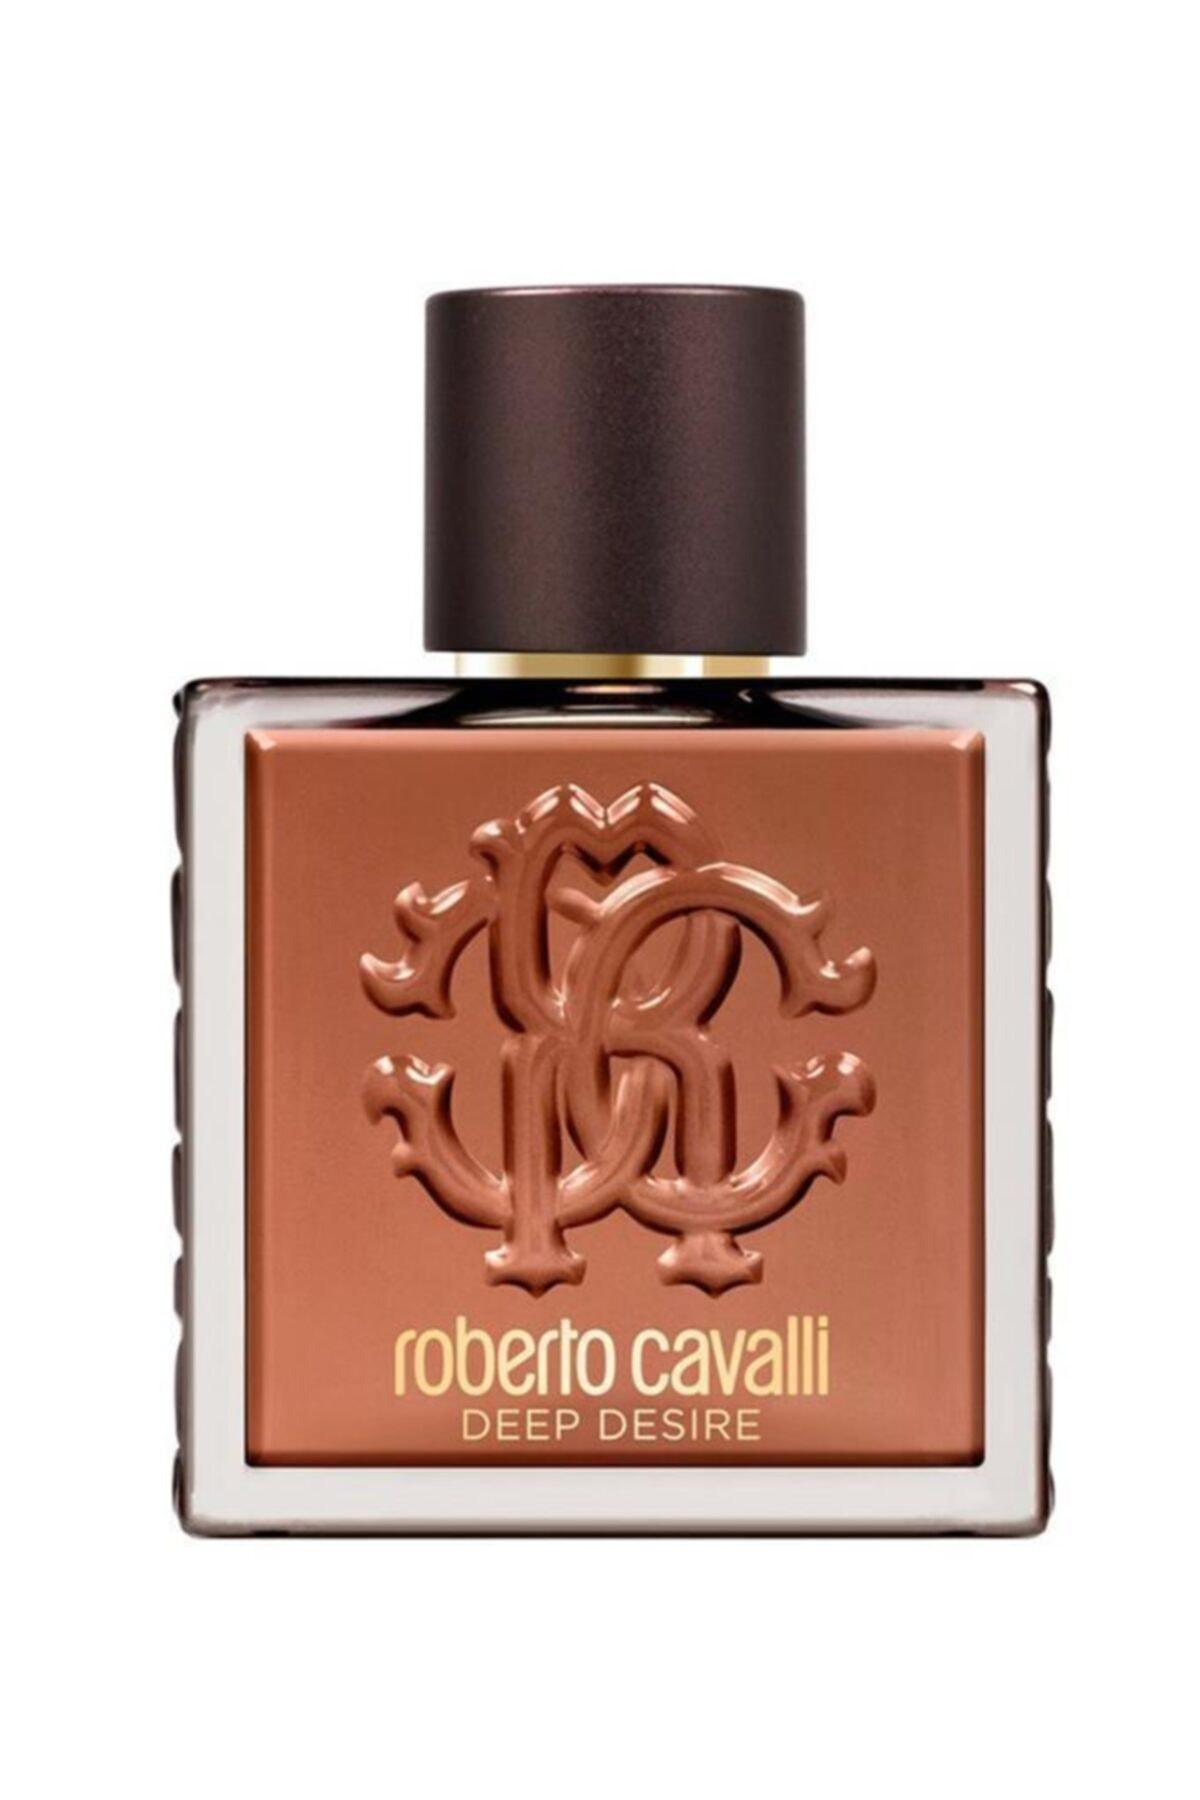 Roberto Cavalli Uomo Deep Desire Edt 100 ml Erkek Parfüm 3614227742642 1